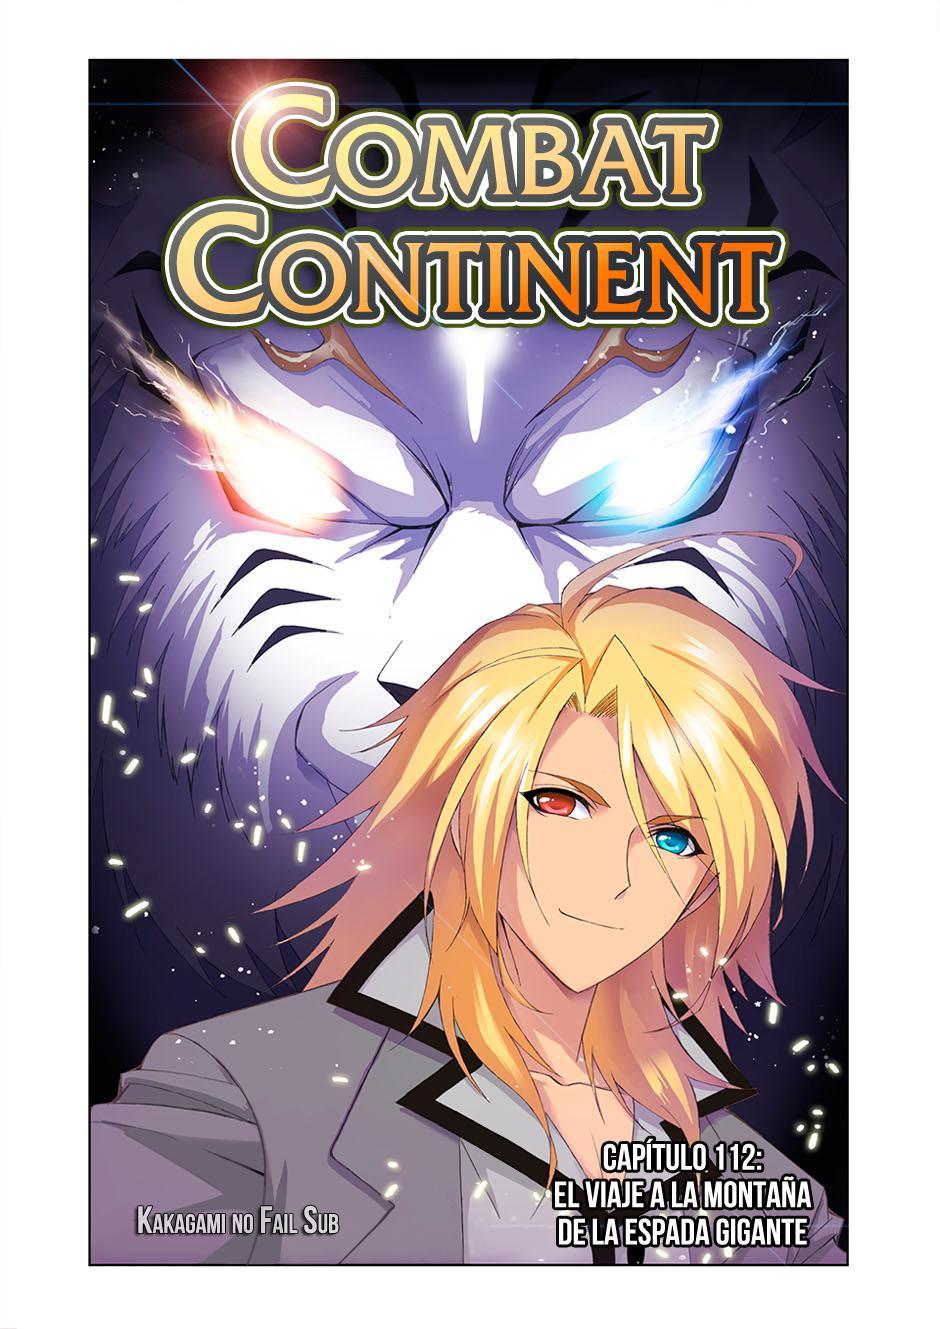 http://c5.ninemanga.com/es_manga/18/16210/417362/dbad2066681ee9062972ae33e0be6d7d.jpg Page 2